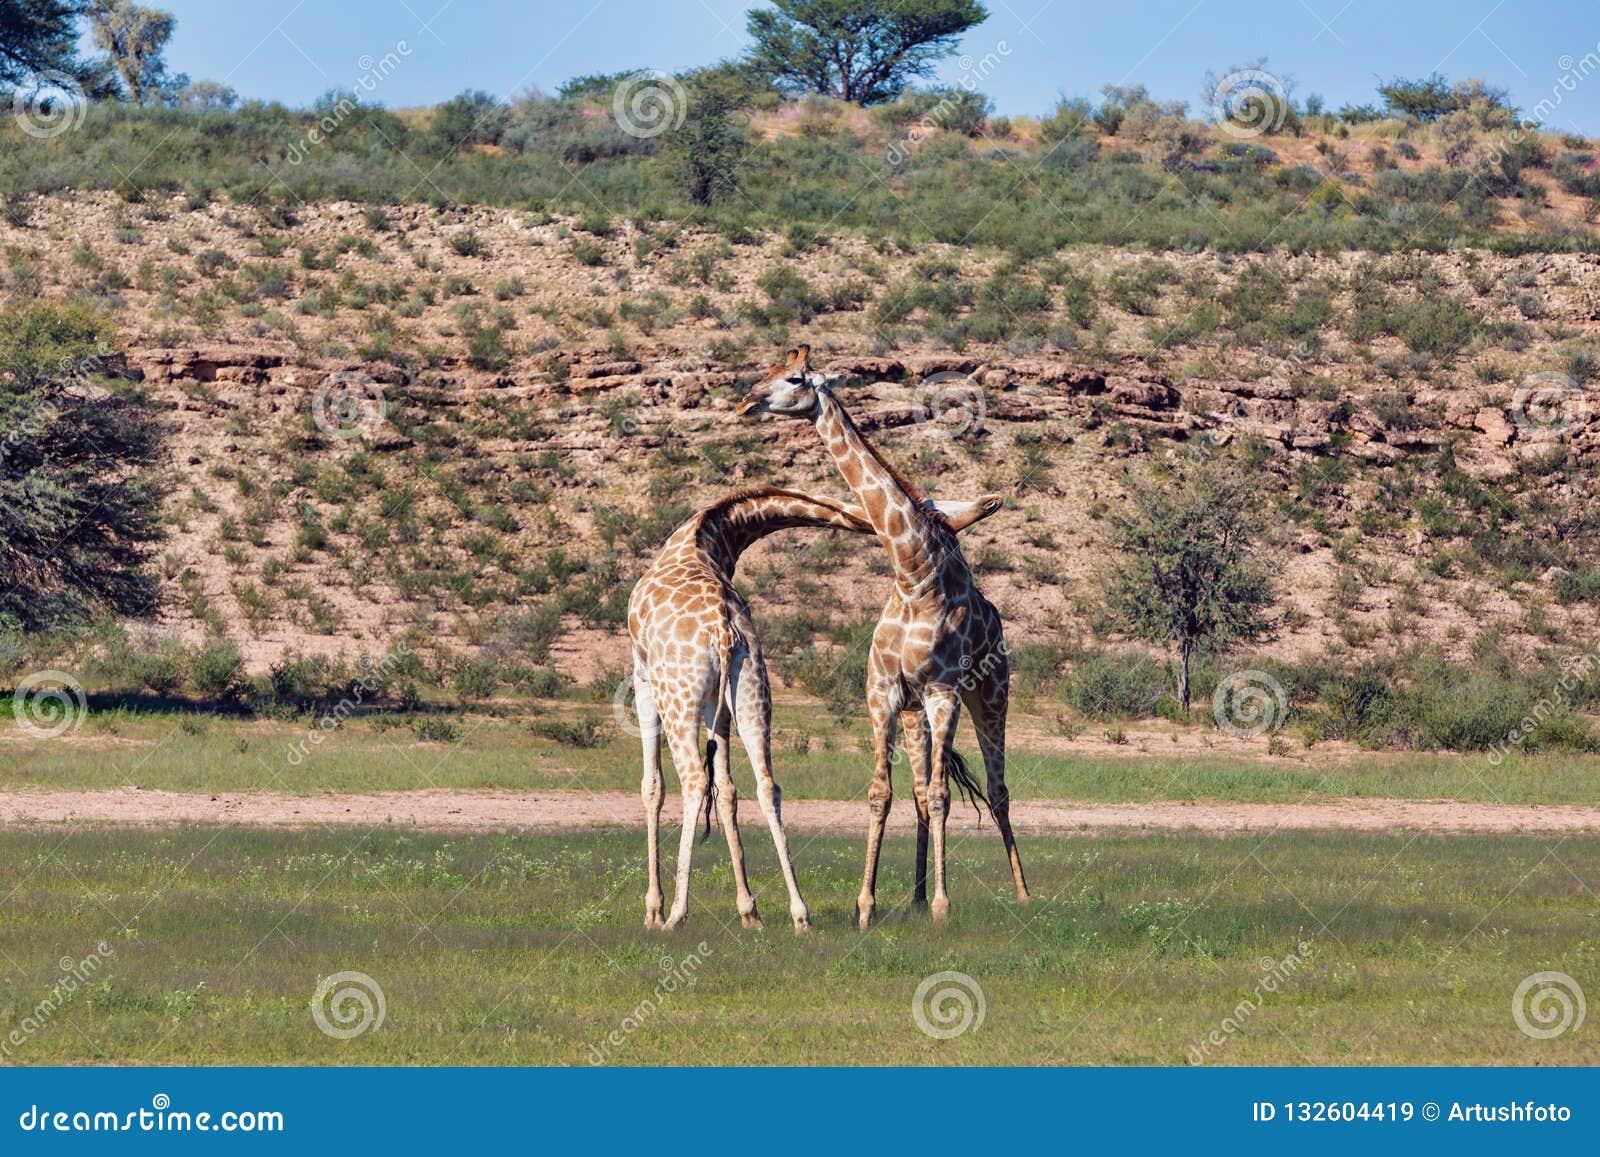 Cute Giraffes in love, South Africa wildlife